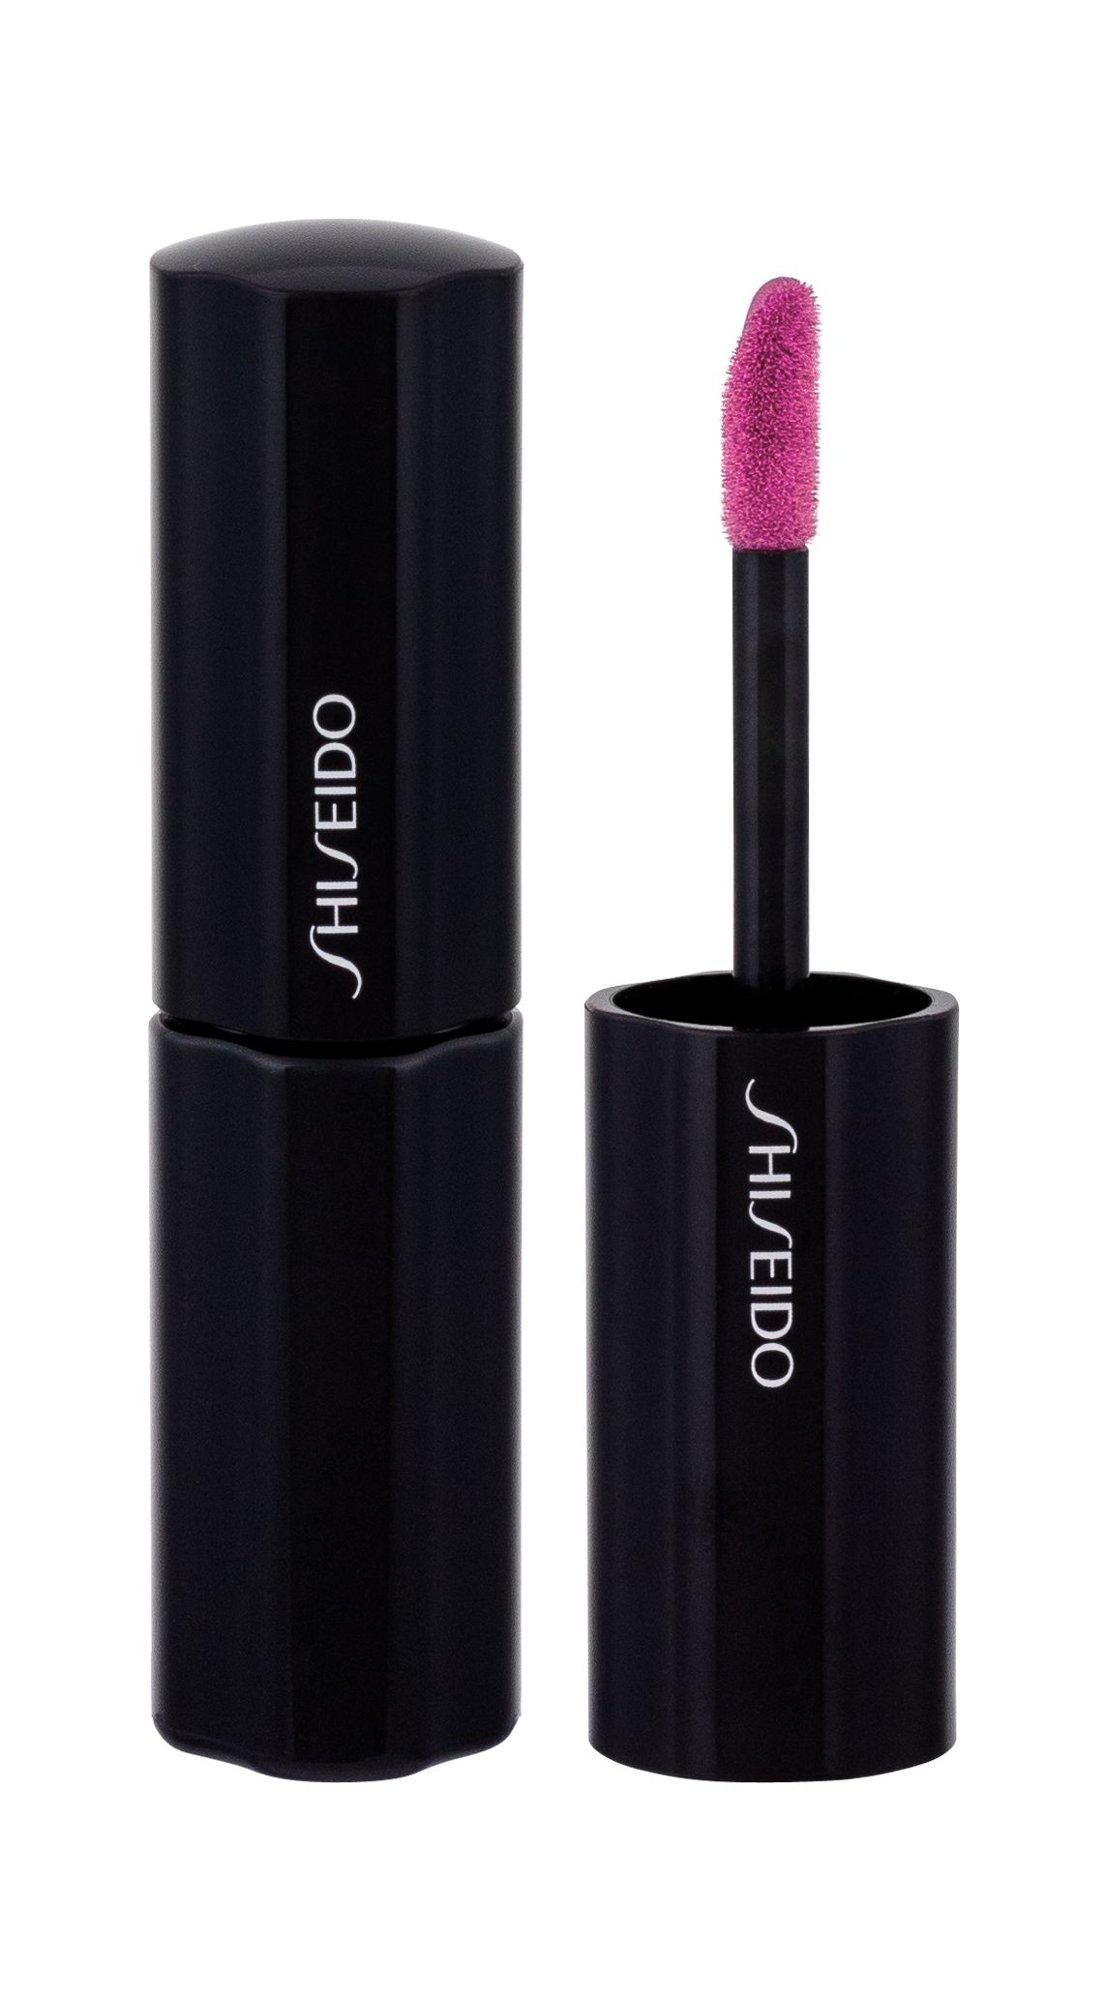 Shiseido Lacquer Rouge Lipstick 6ml PK425